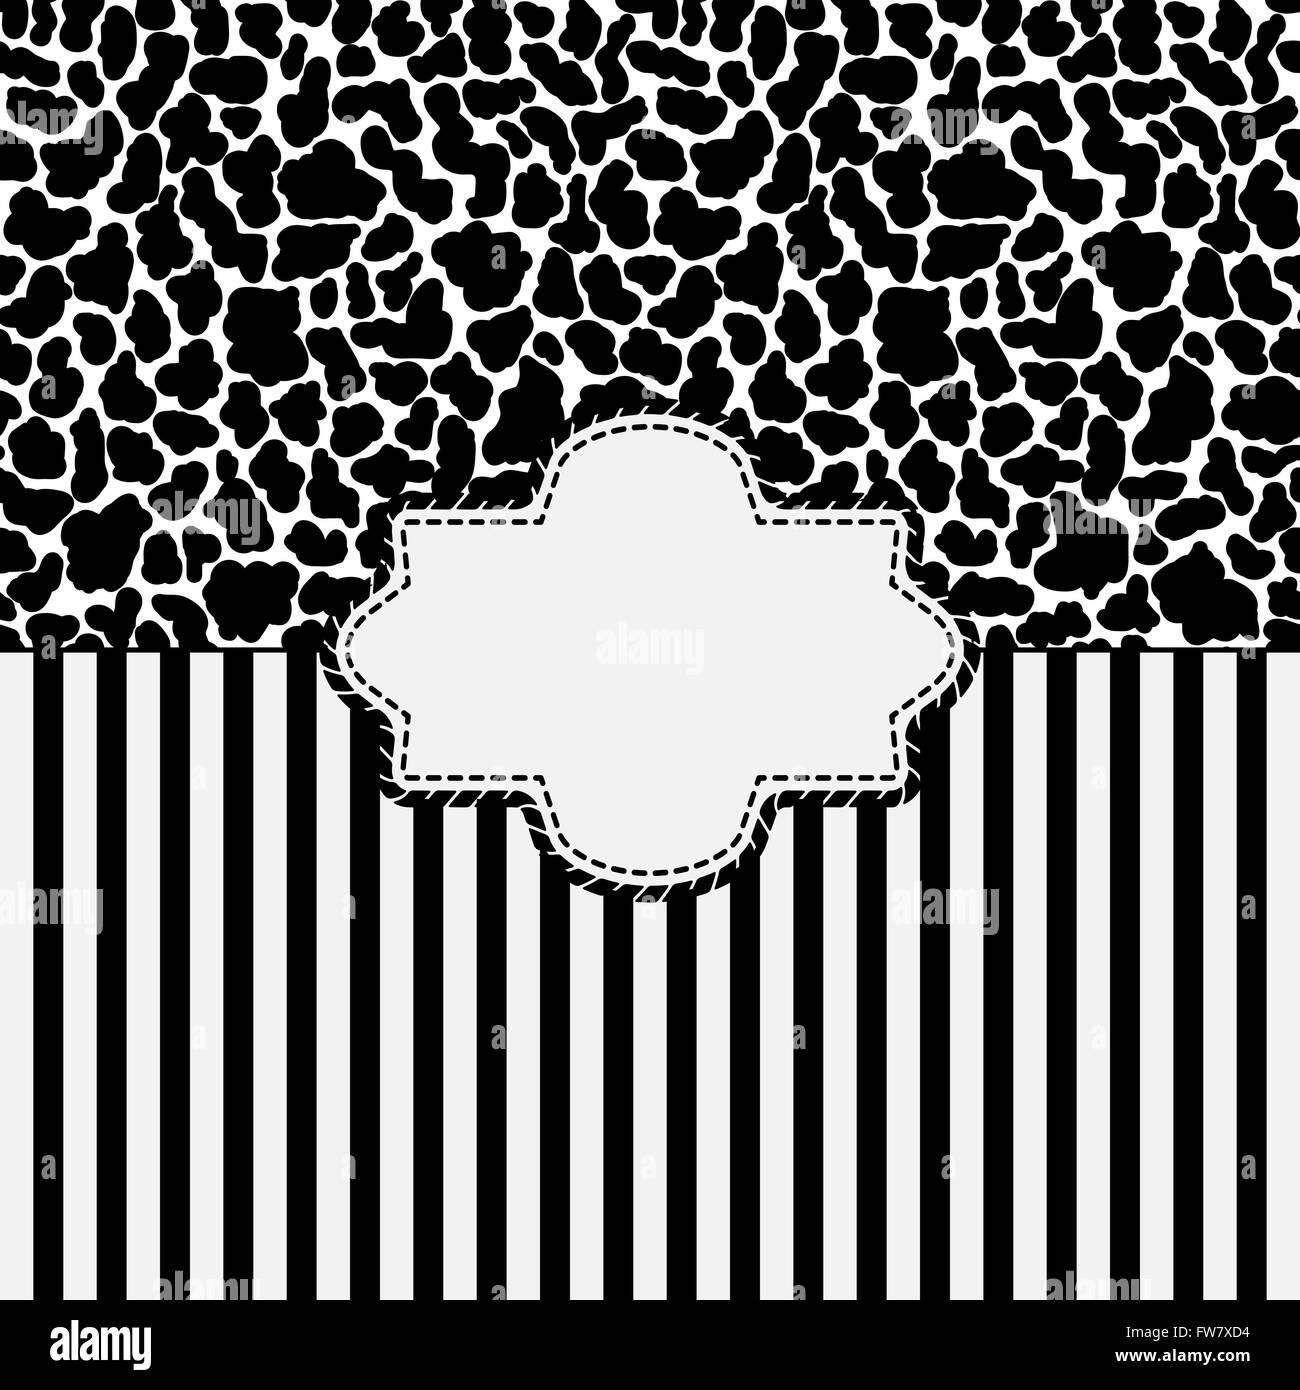 animal skin background - vector illustration. eps 8 - Stock Vector